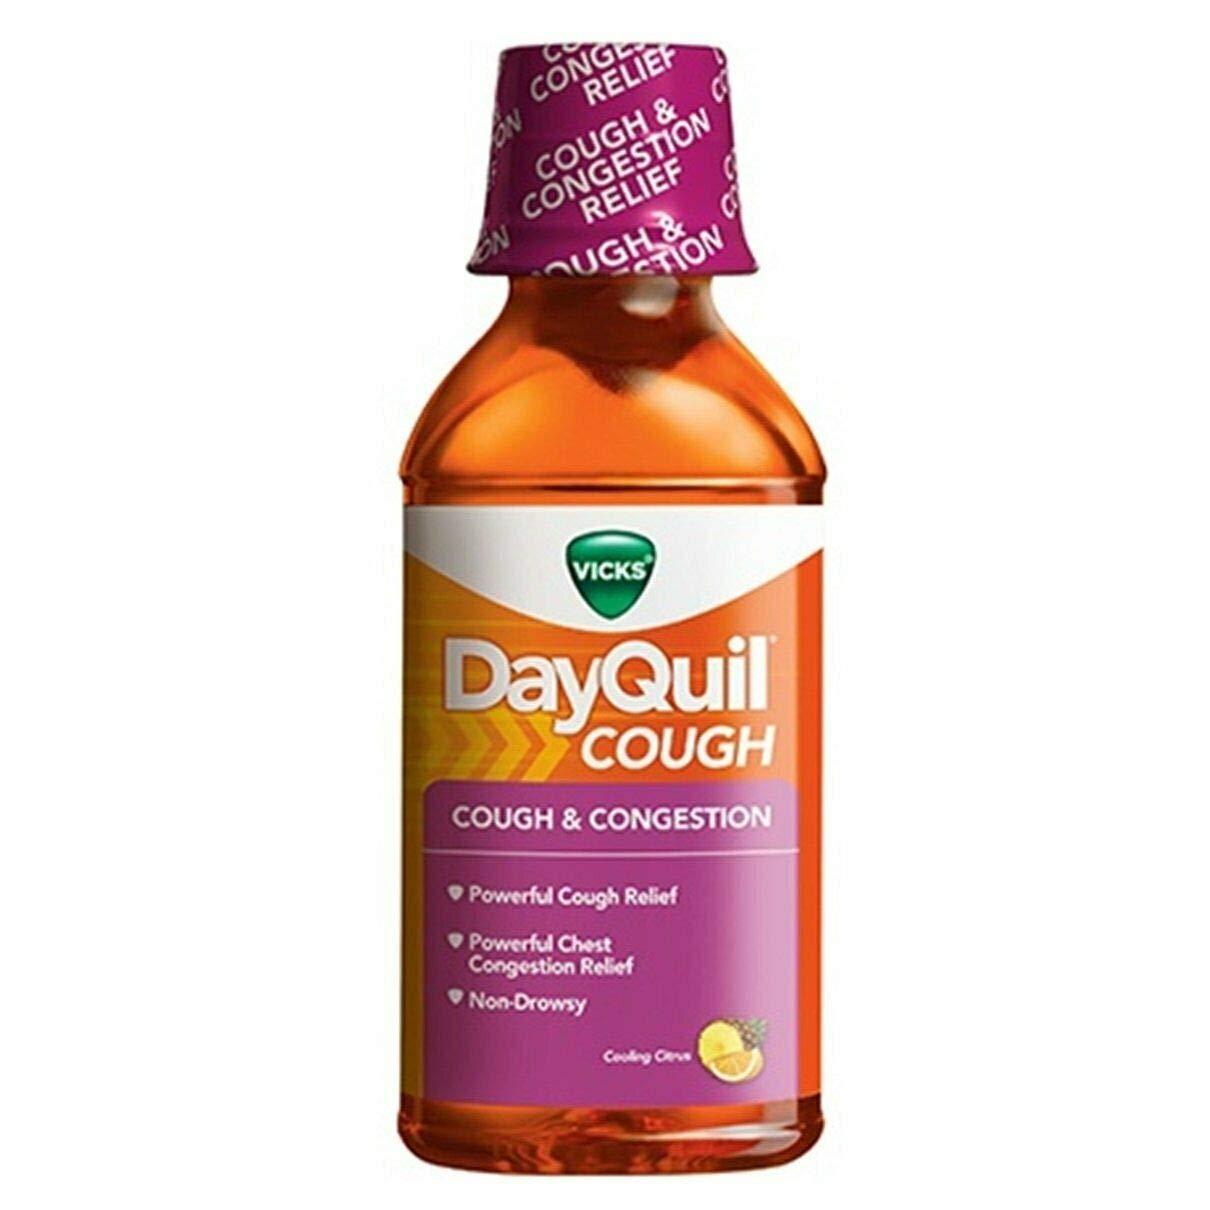 Vicks DayQuil Mucus Control Liquid Citrus Blend Flavor - 12 oz, Pack of 4